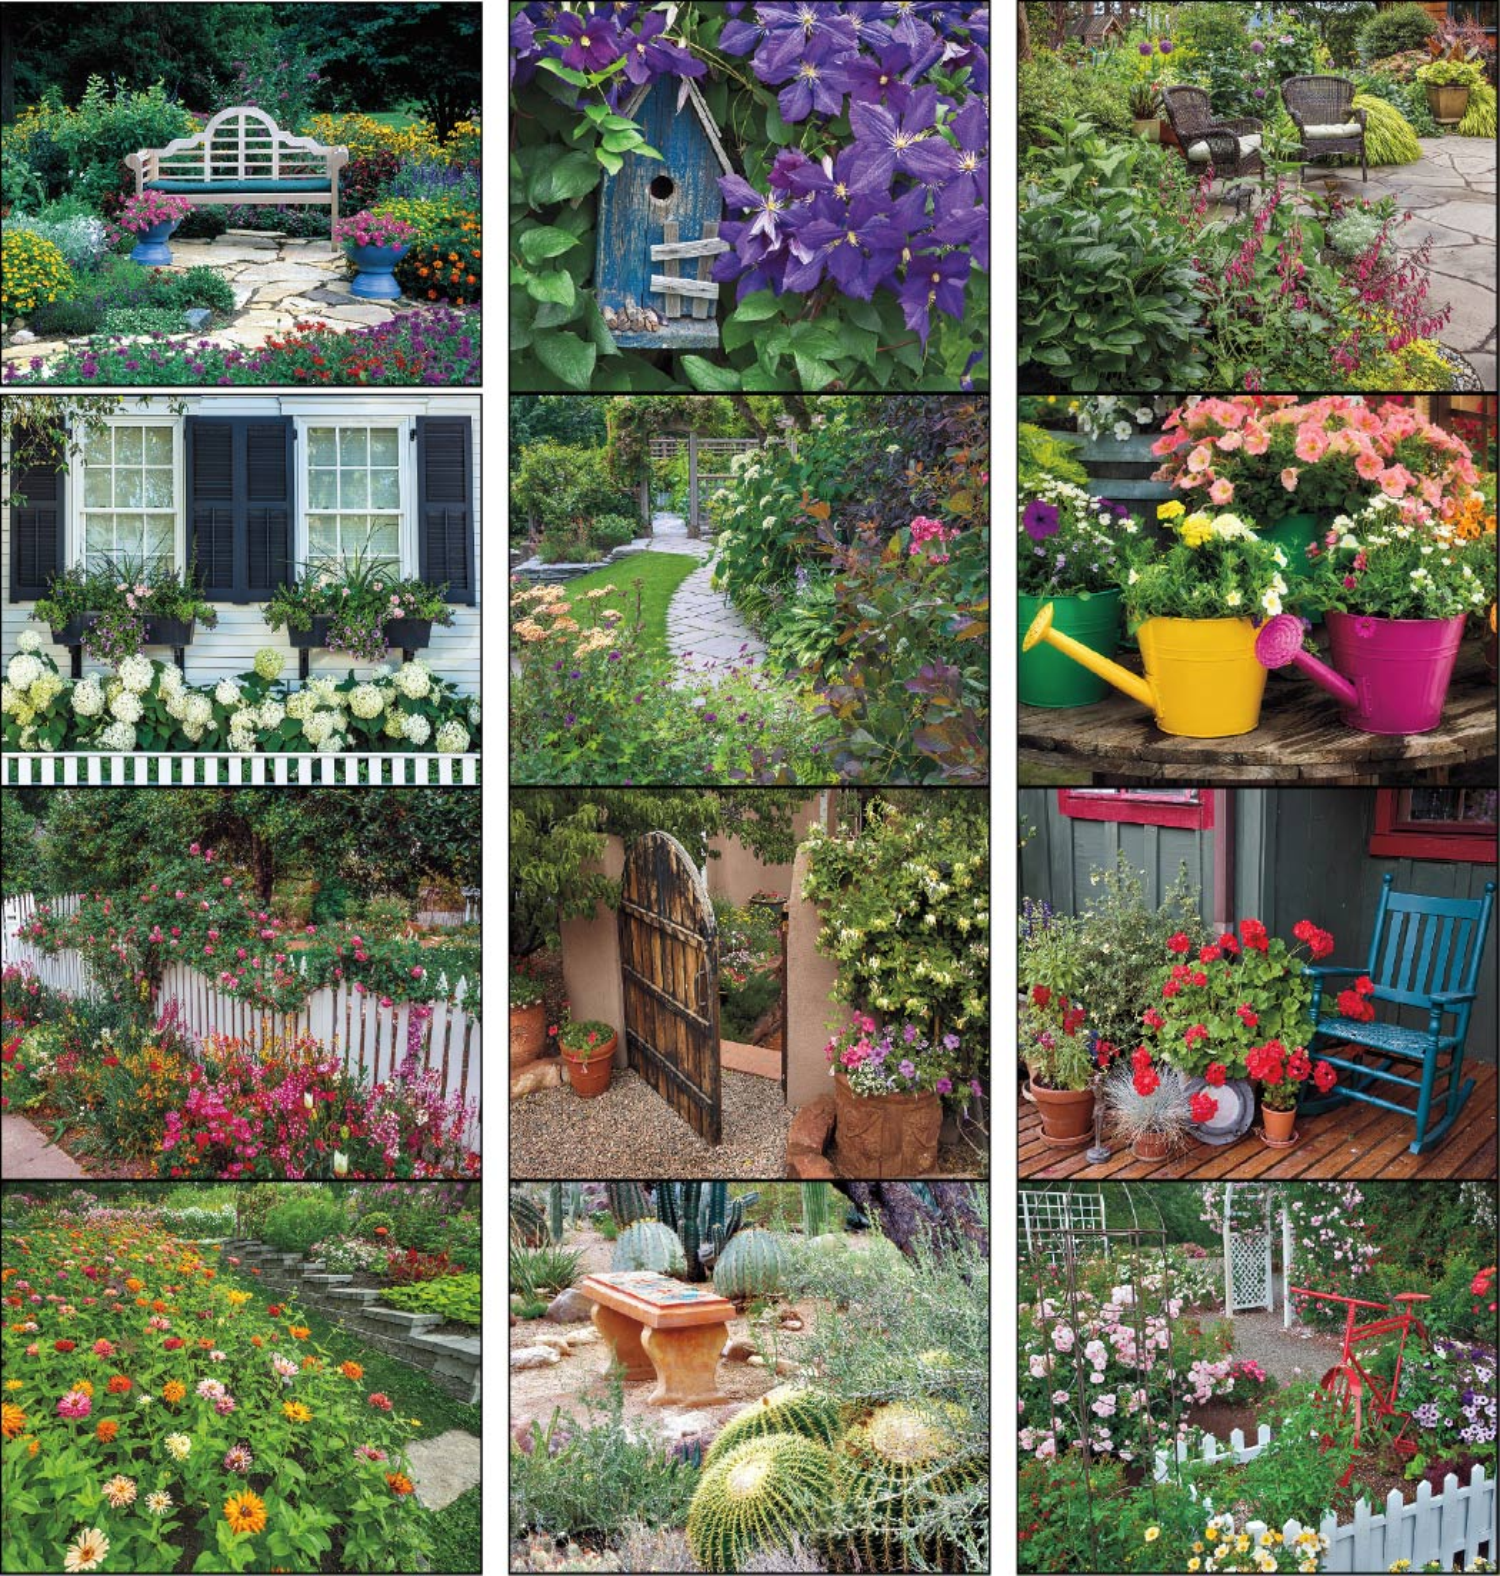 Garden walk promotional calendar 2018 stapled for Gardening 2018 calendar